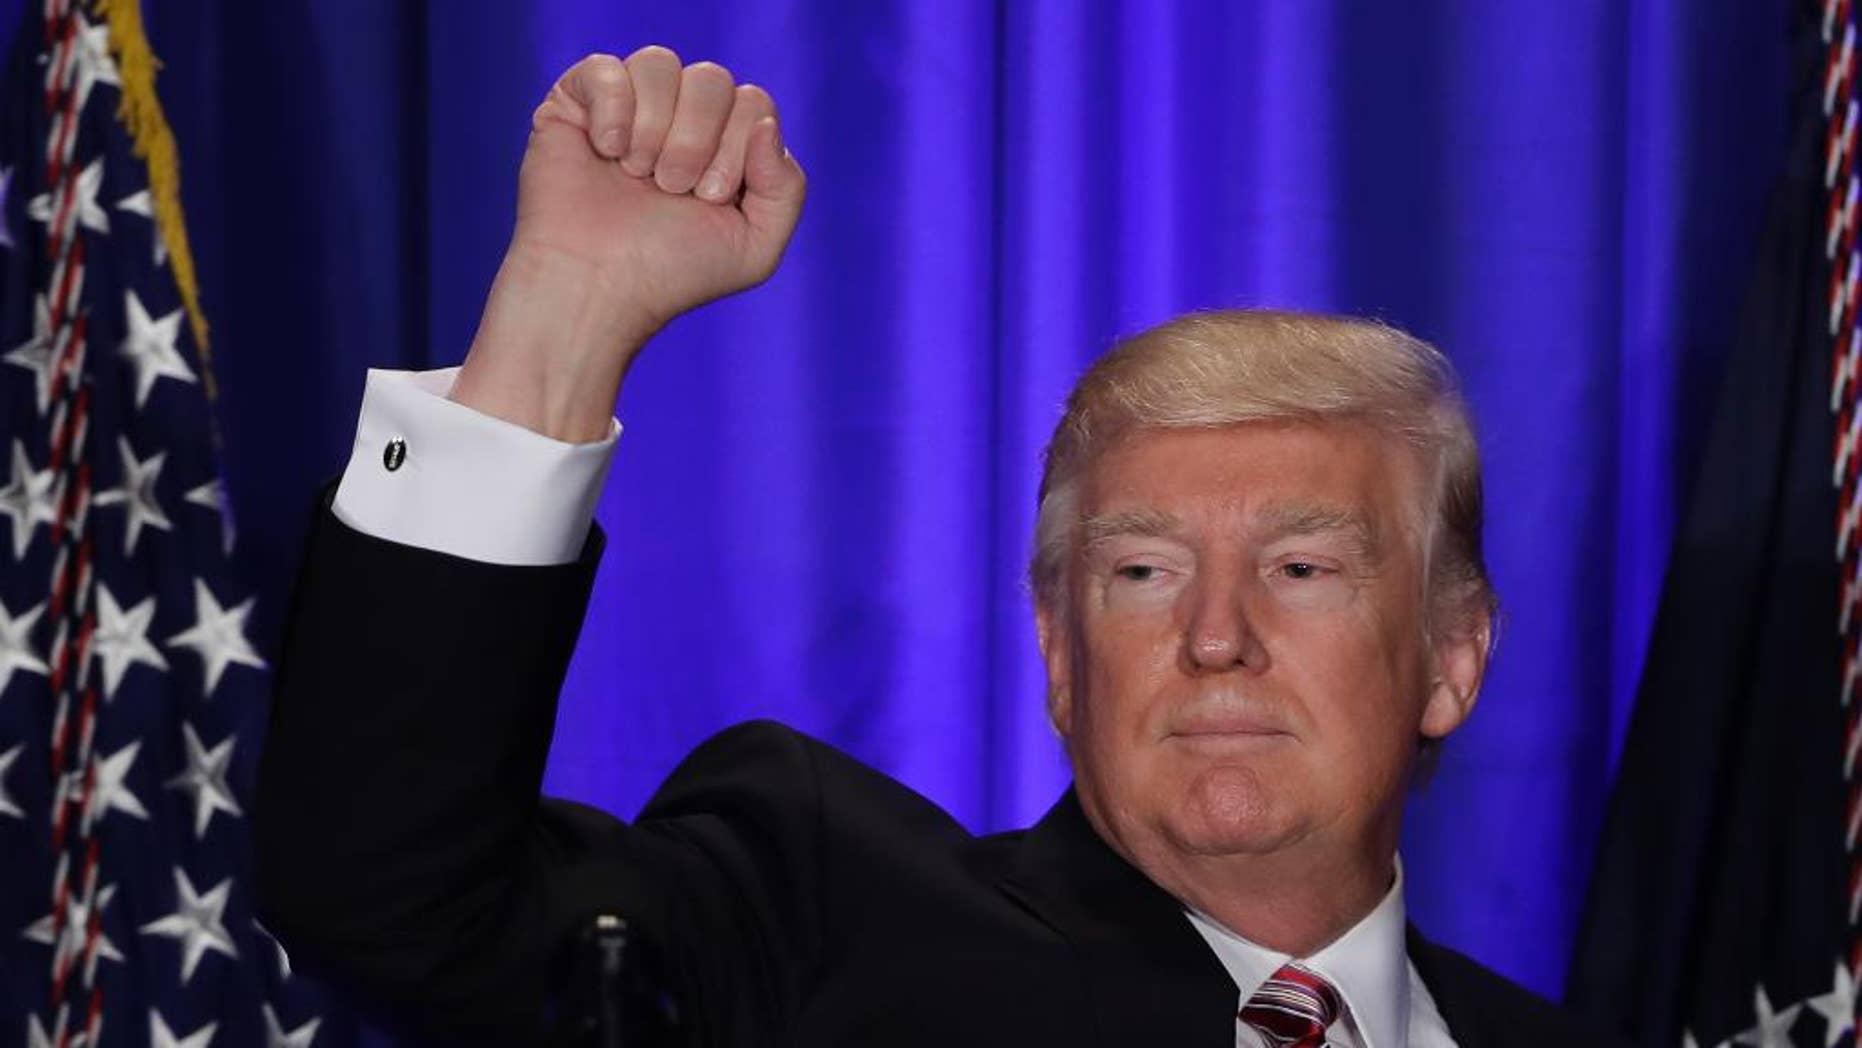 President Donald Trump gestures while speaking at the Republican congressional retreat in Philadelphia, Thursday, Jan. 26, 2017. (AP Photo/Matt Rourke)